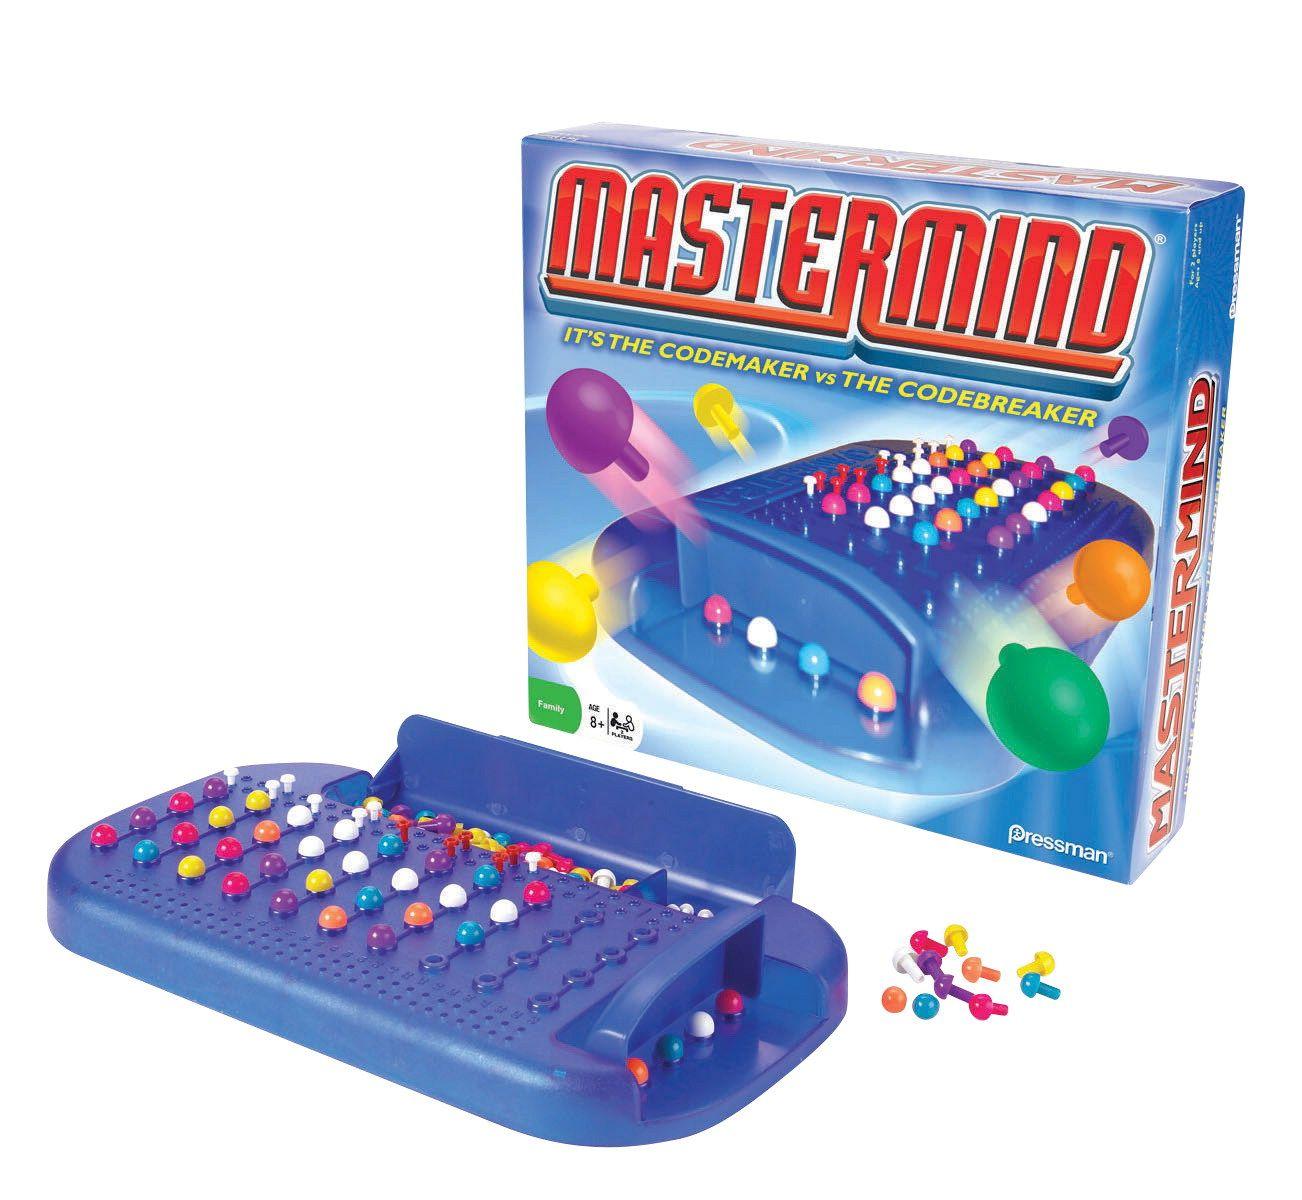 Educational Games for Kids - 369027 - Pressman Mastermind Game